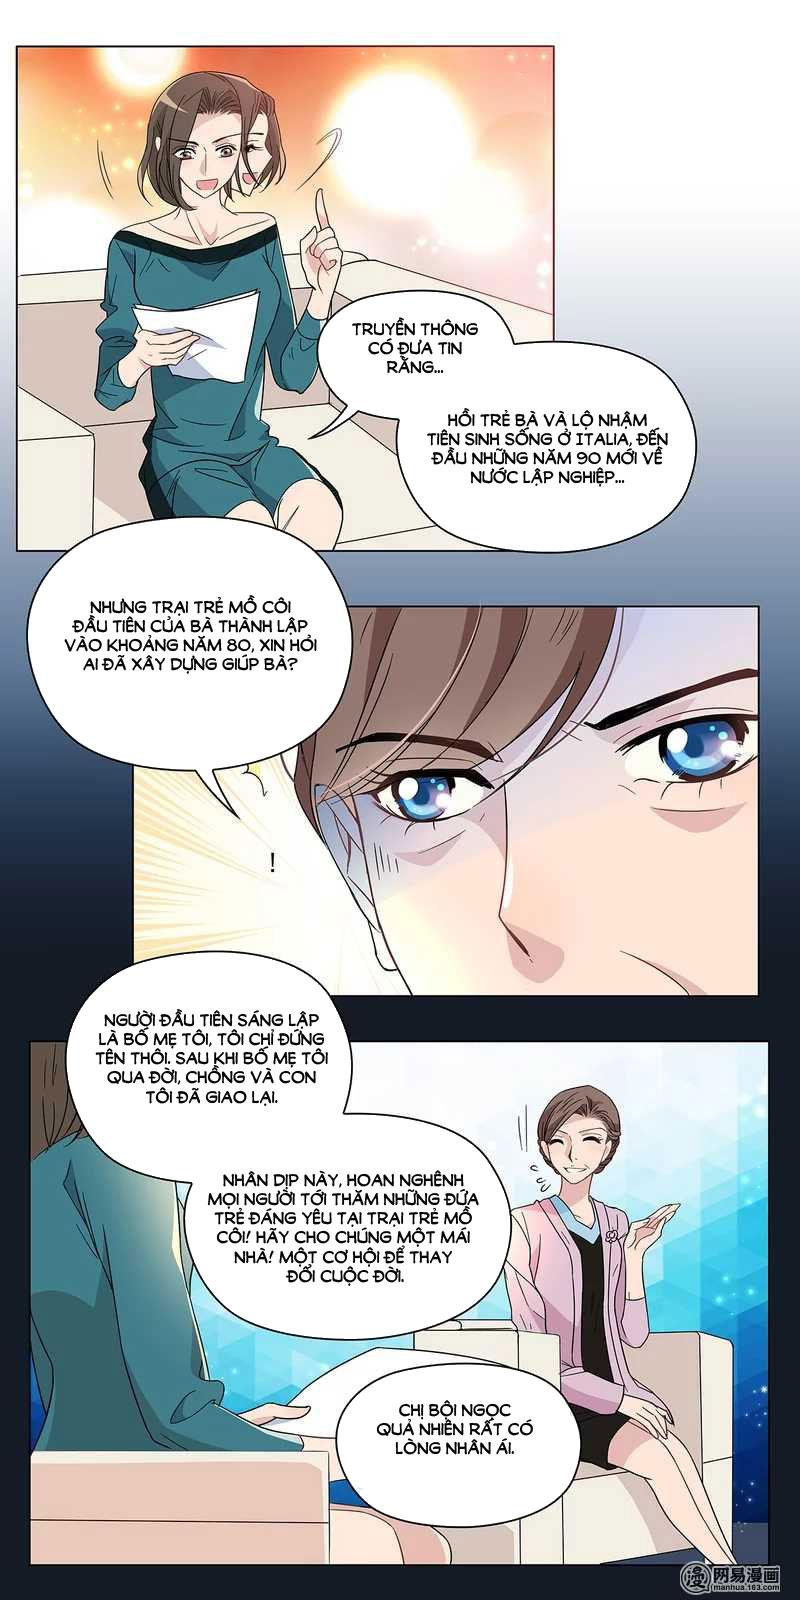 Mai Nữ Đồng Tiểu Nộ Chapter 39 - Truyenmoi.xyz